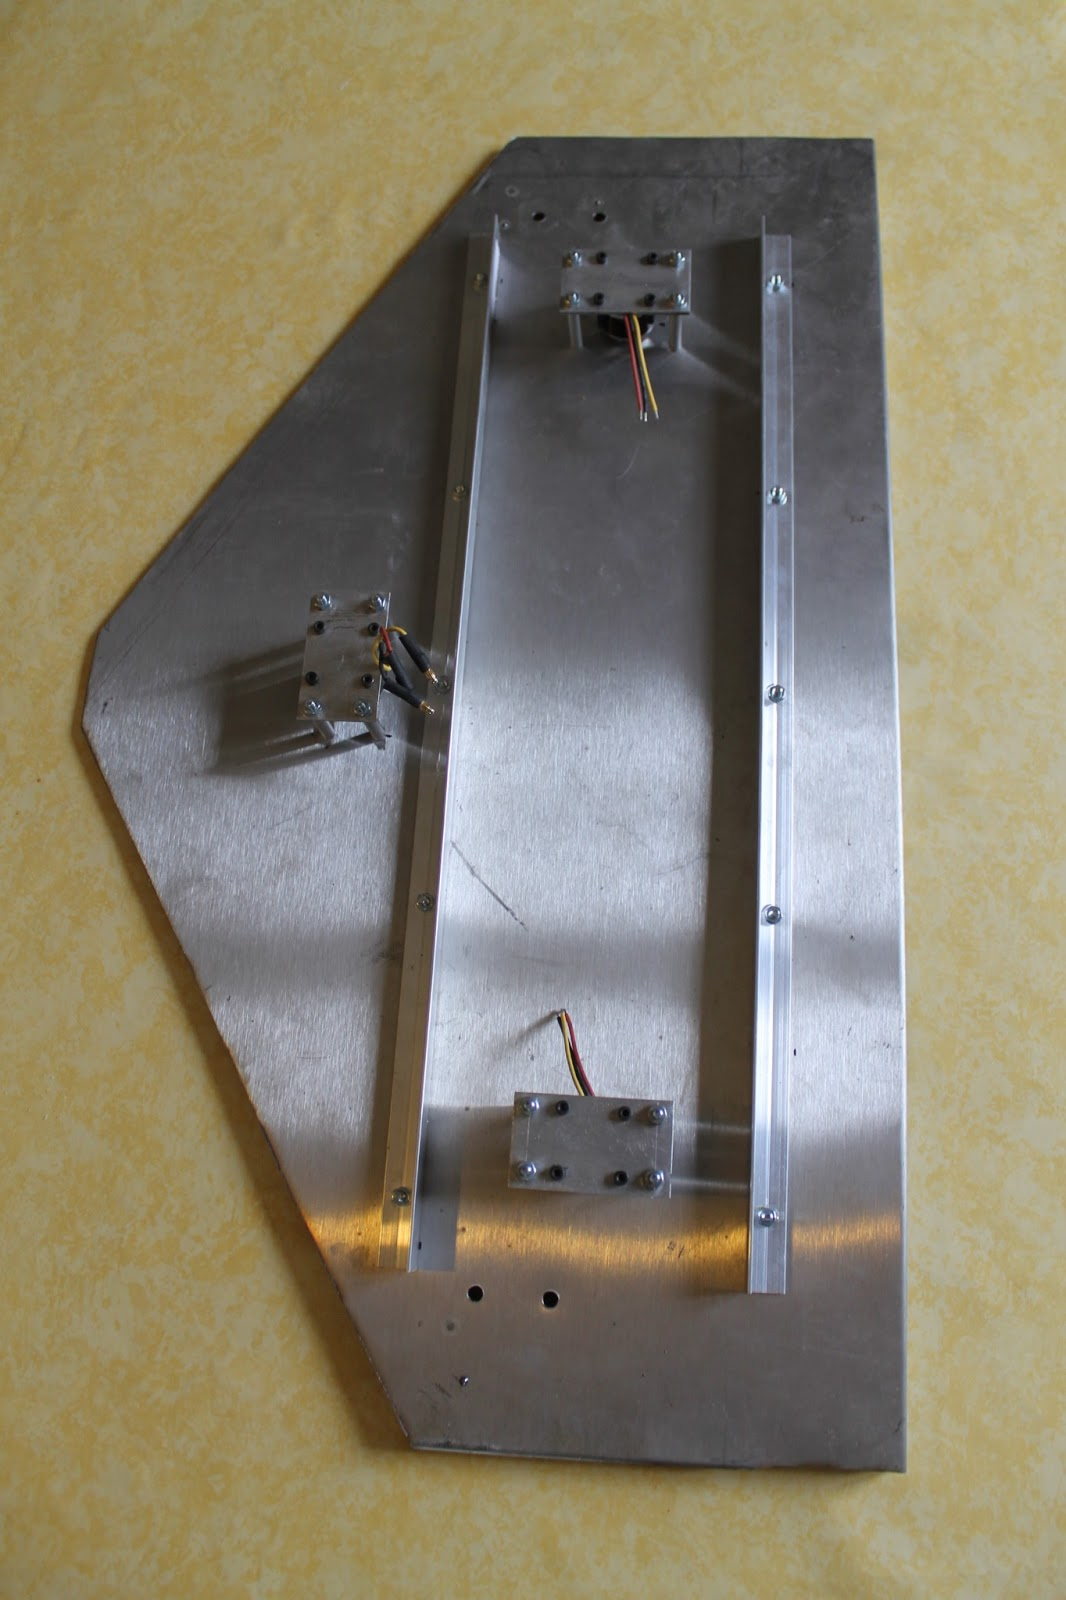 Gt diy cutflower tondeuse robot par arduino